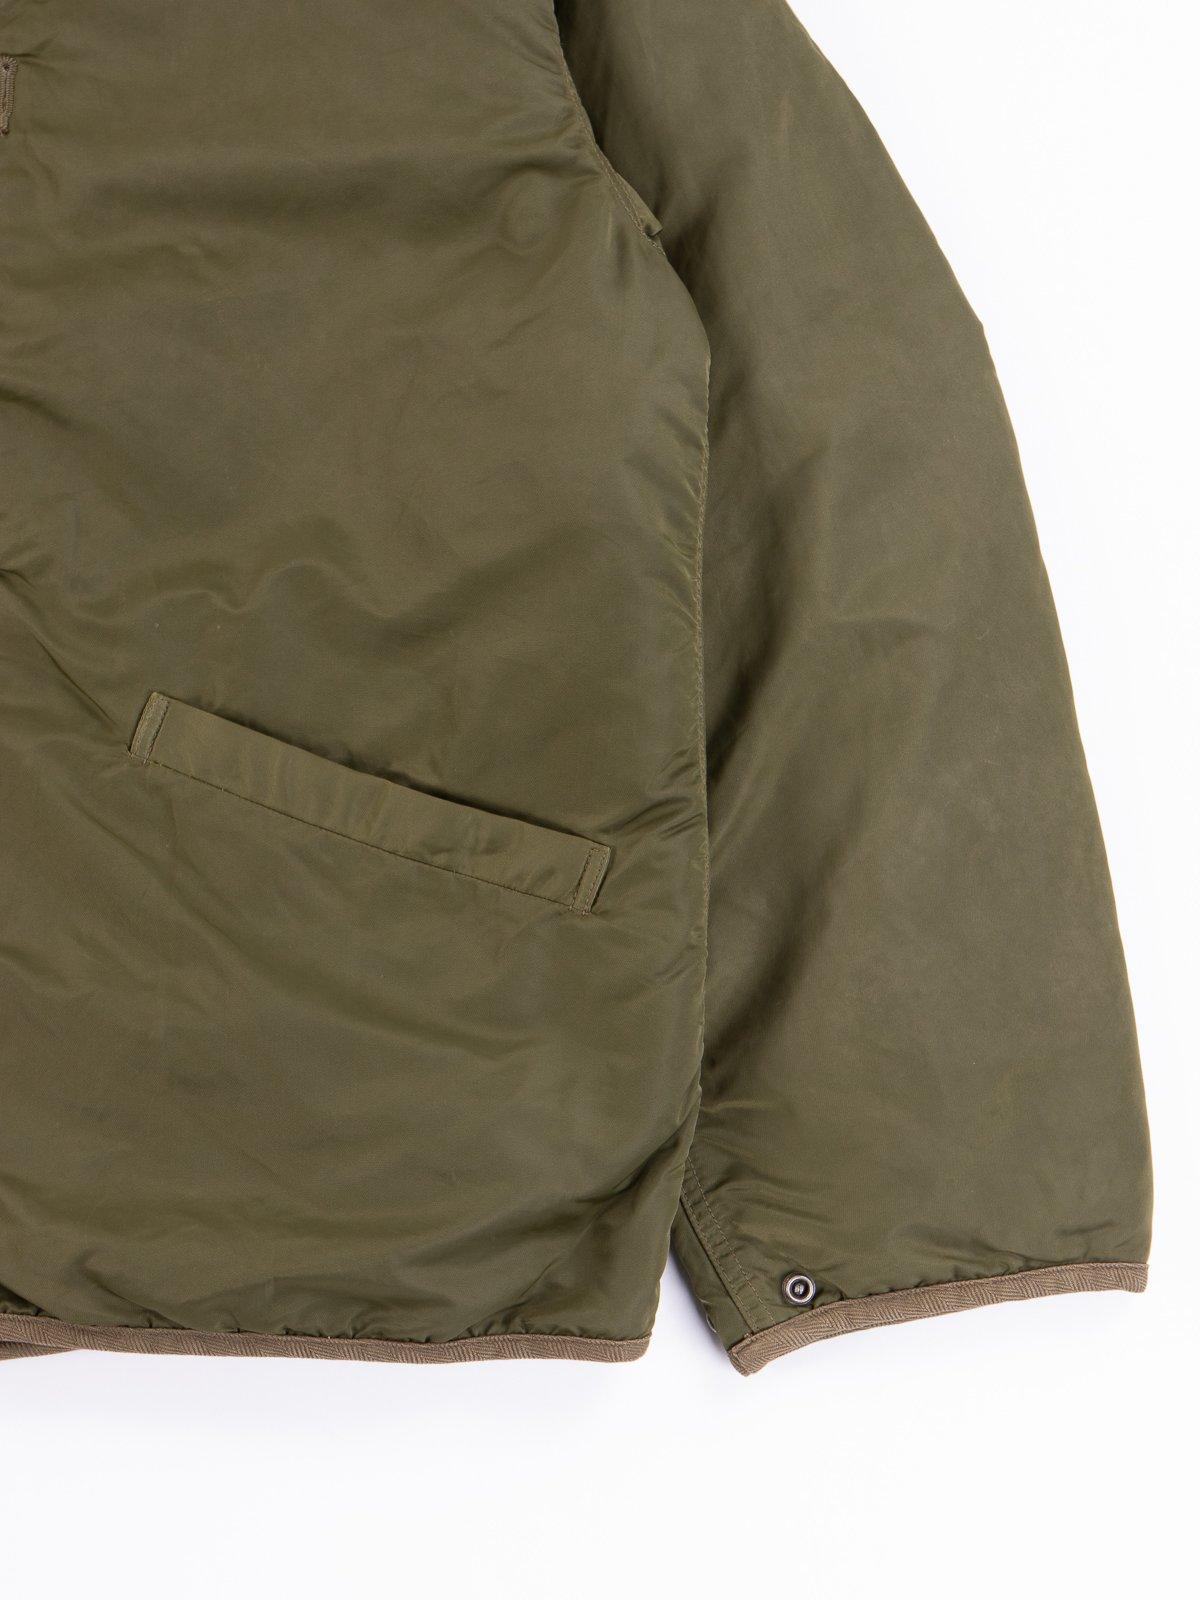 Olive Iris Liner Jacket - Image 3